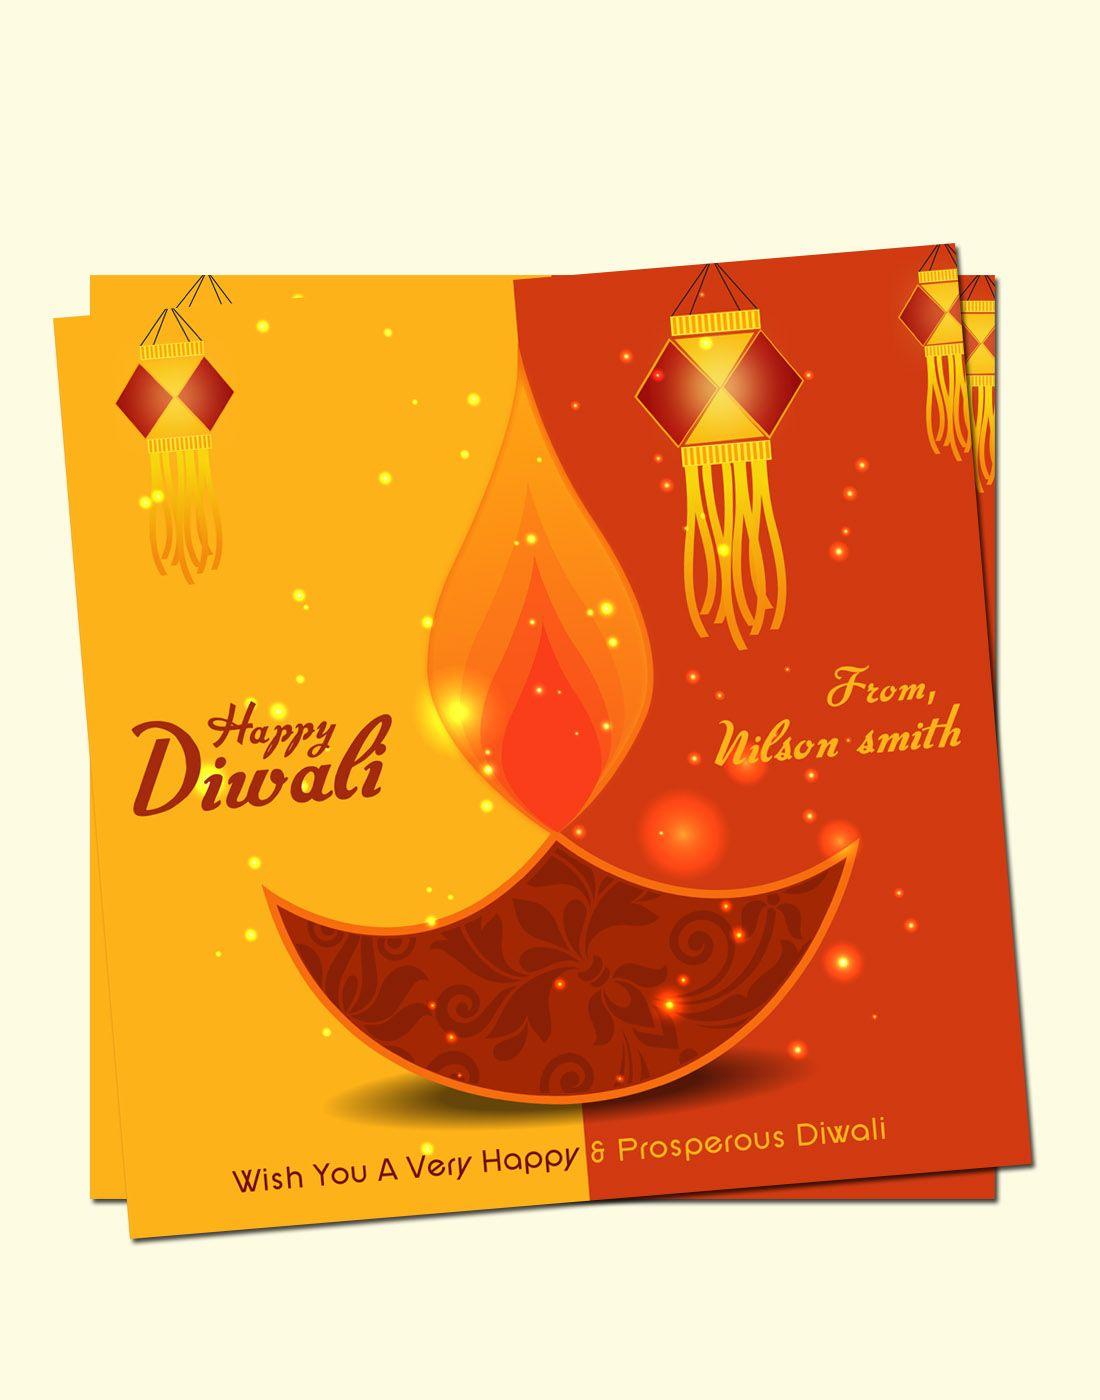 Diwali Vector Card Template | Pinterest | Diwali, Card templates and ...